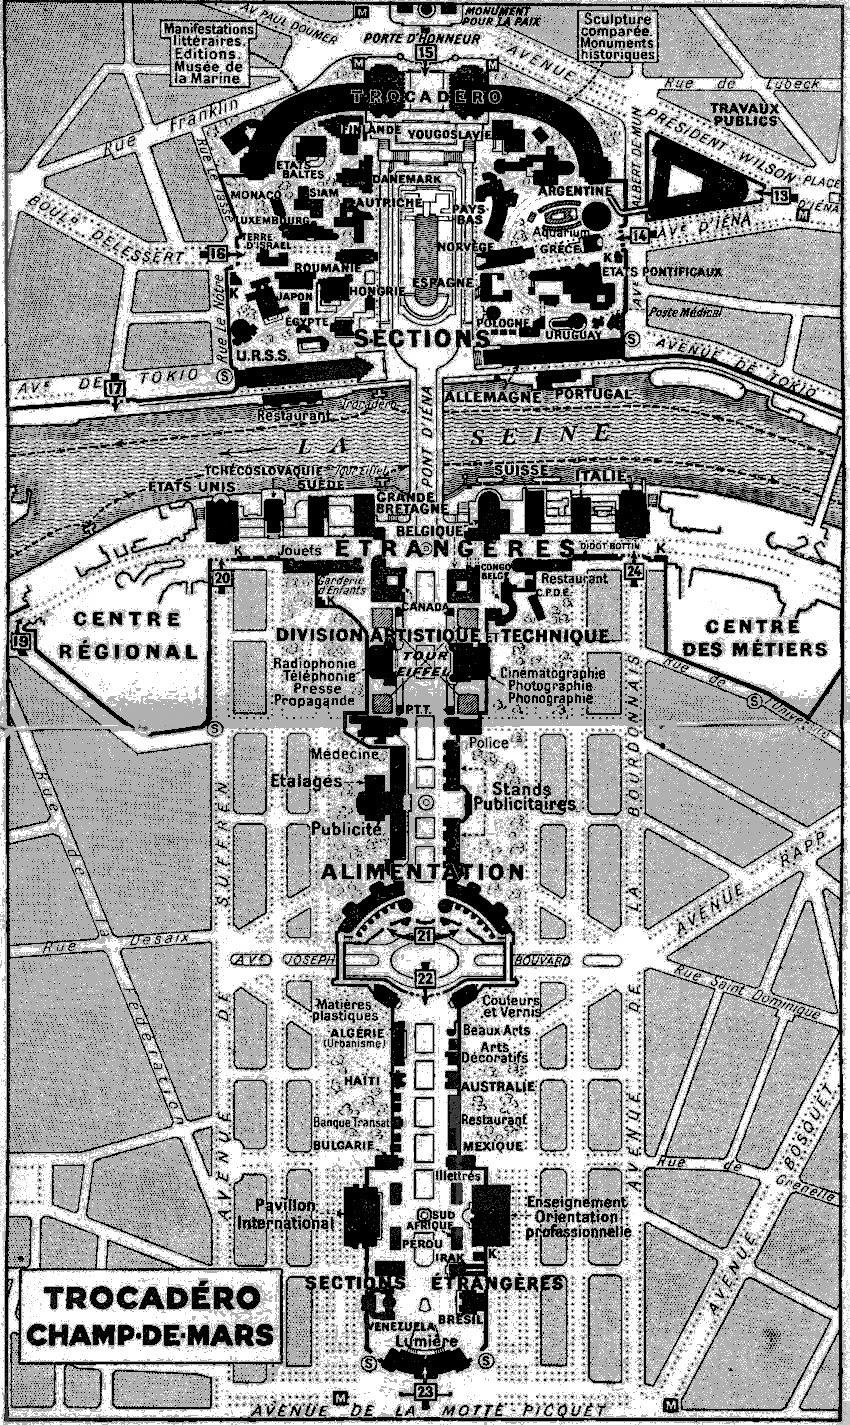 1925 Exposition Plan